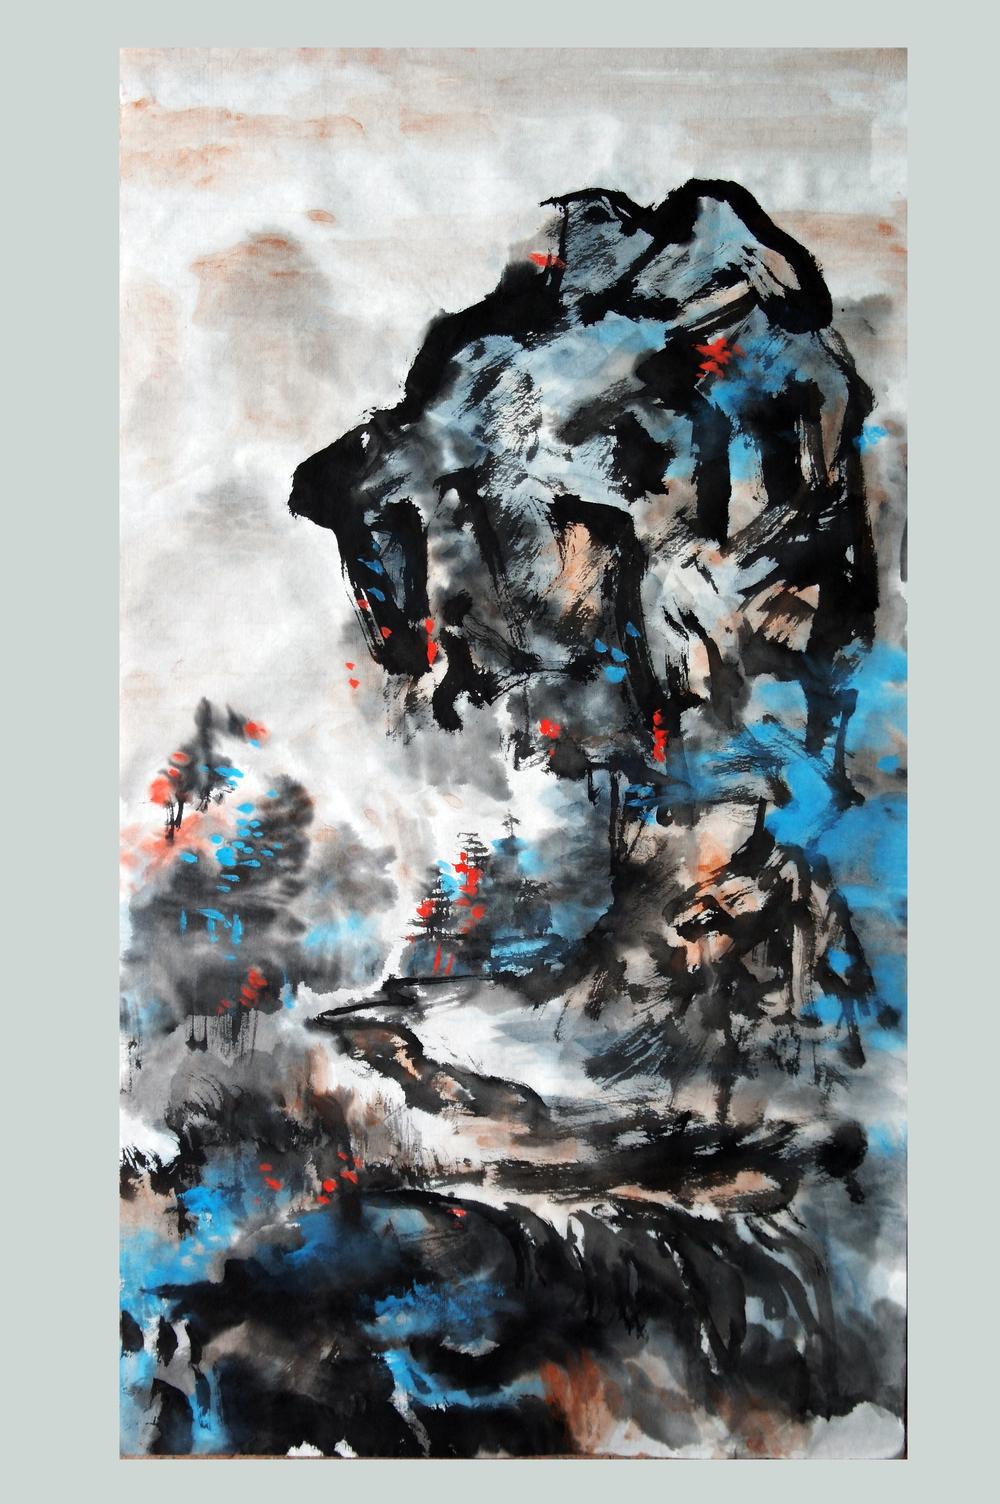 yenny_chinese_painting2.jpg